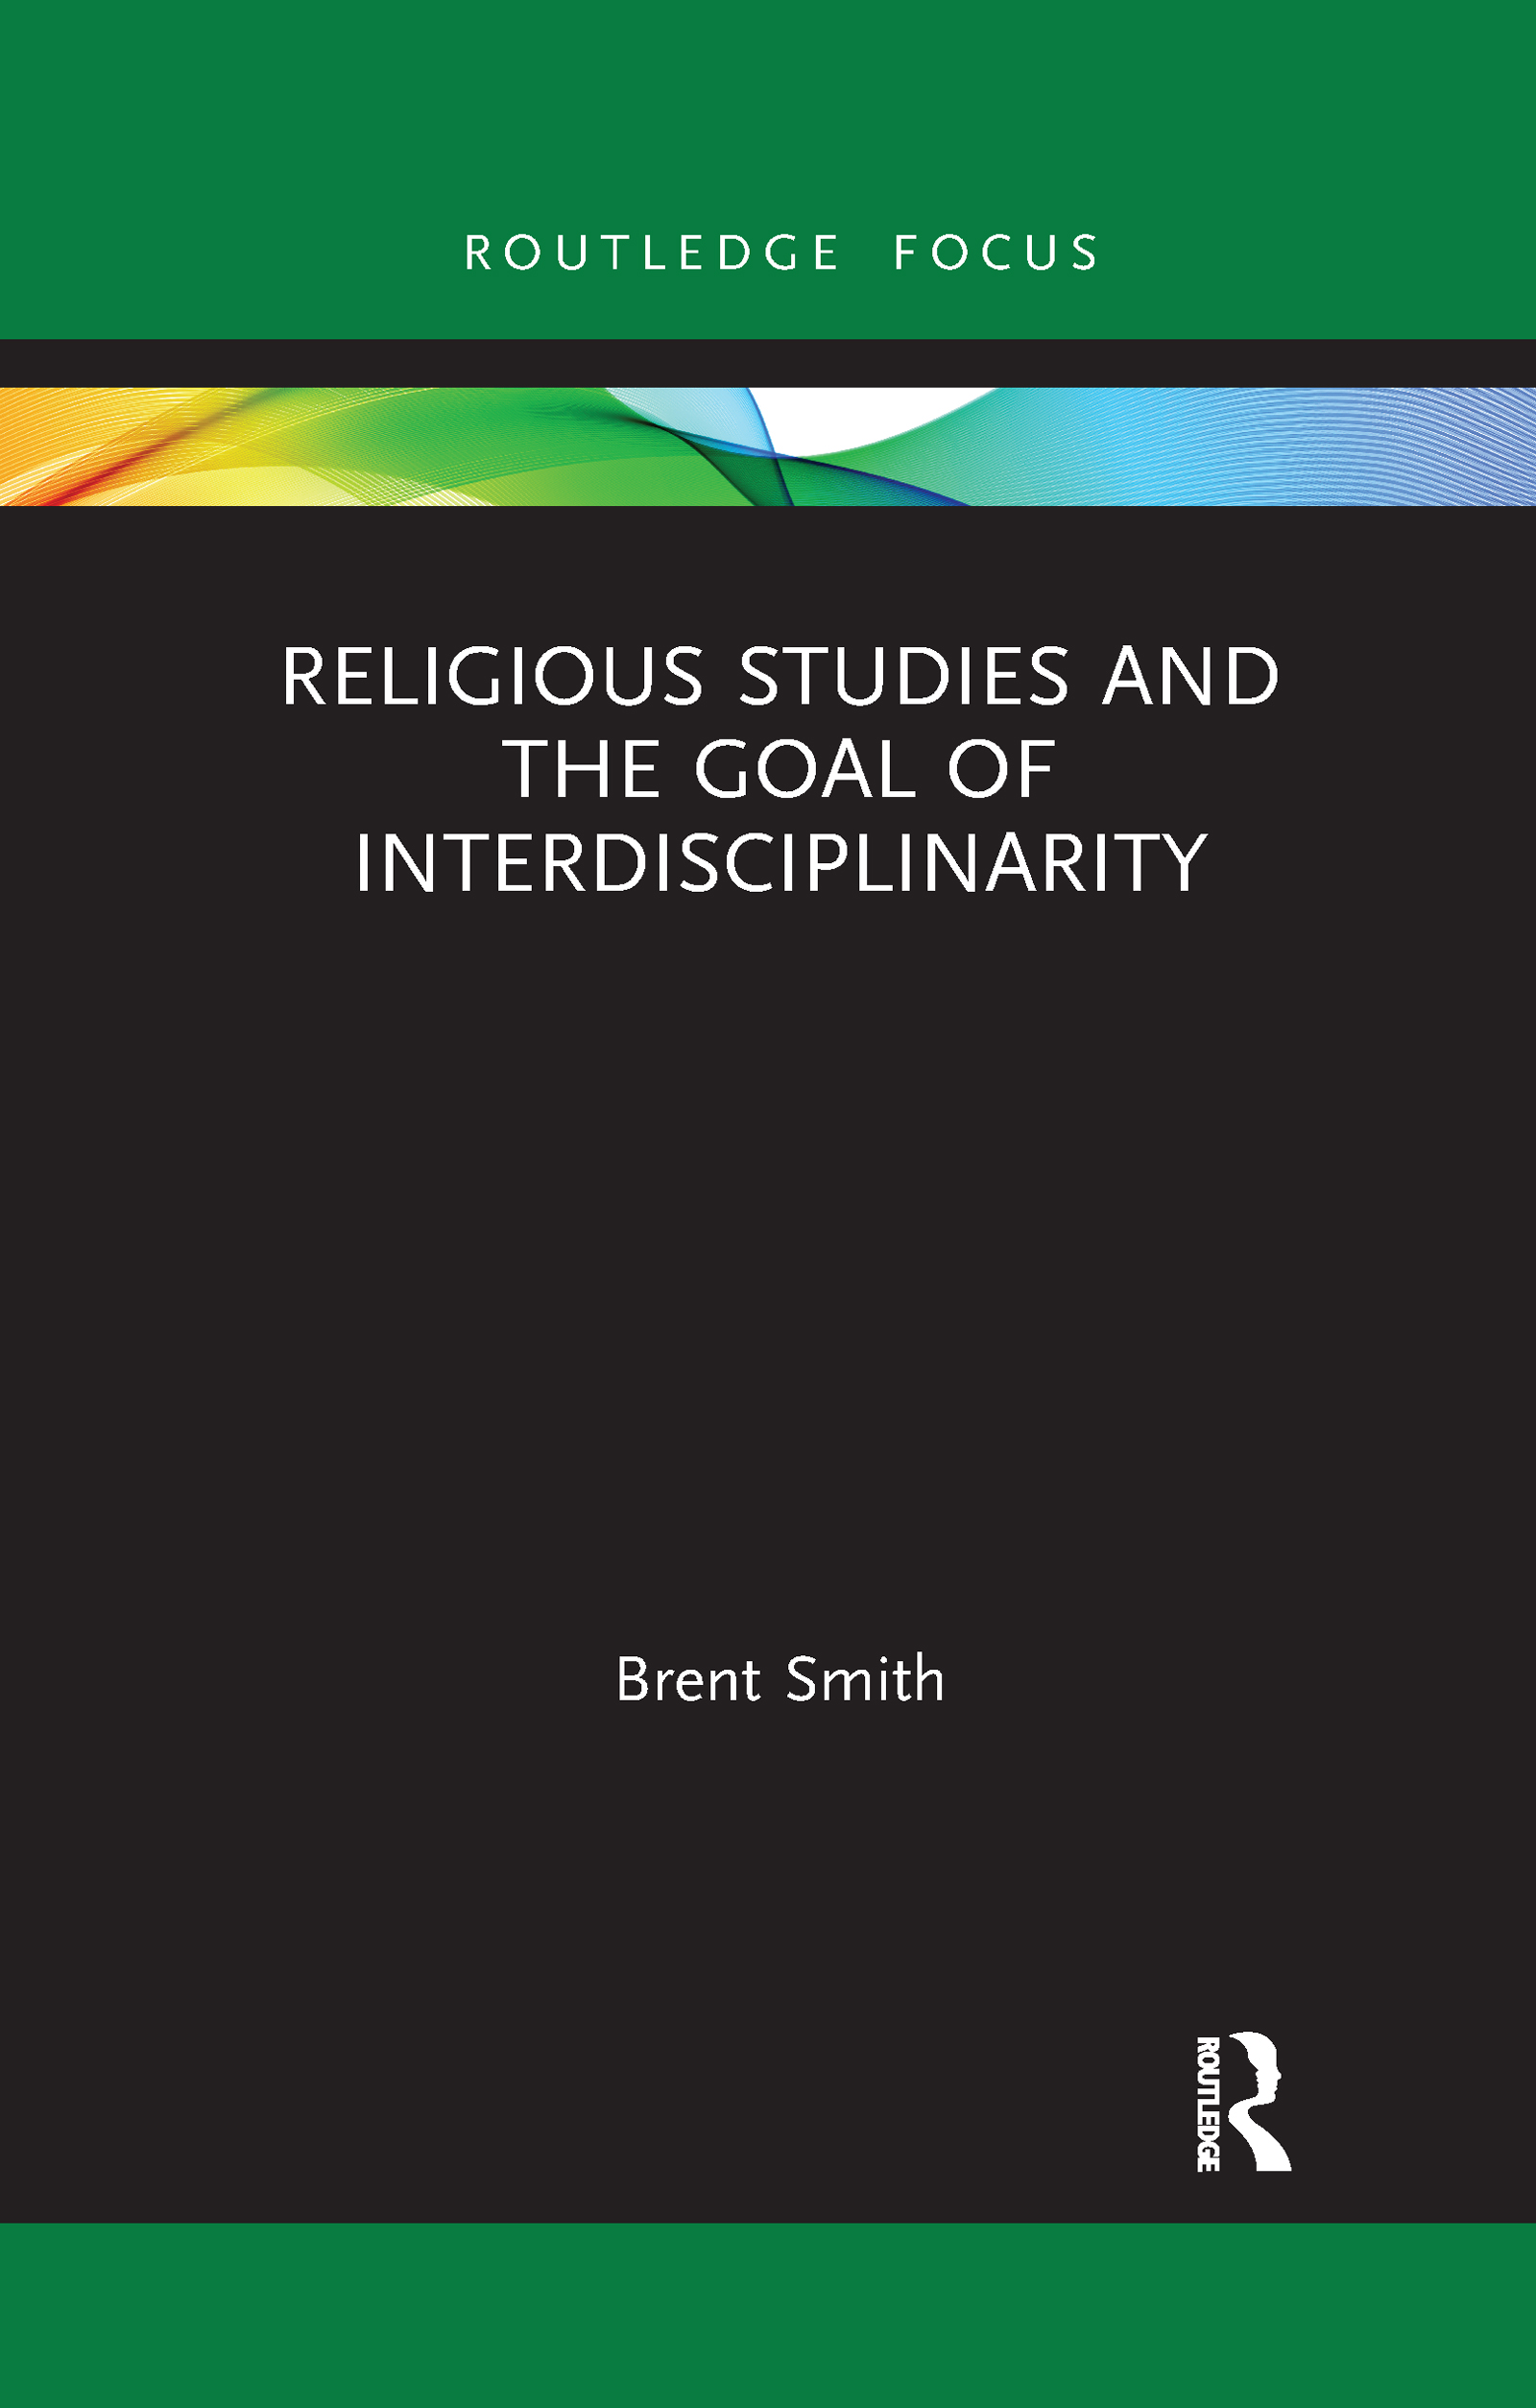 Religious Studies and the Goal of Interdisciplinarity